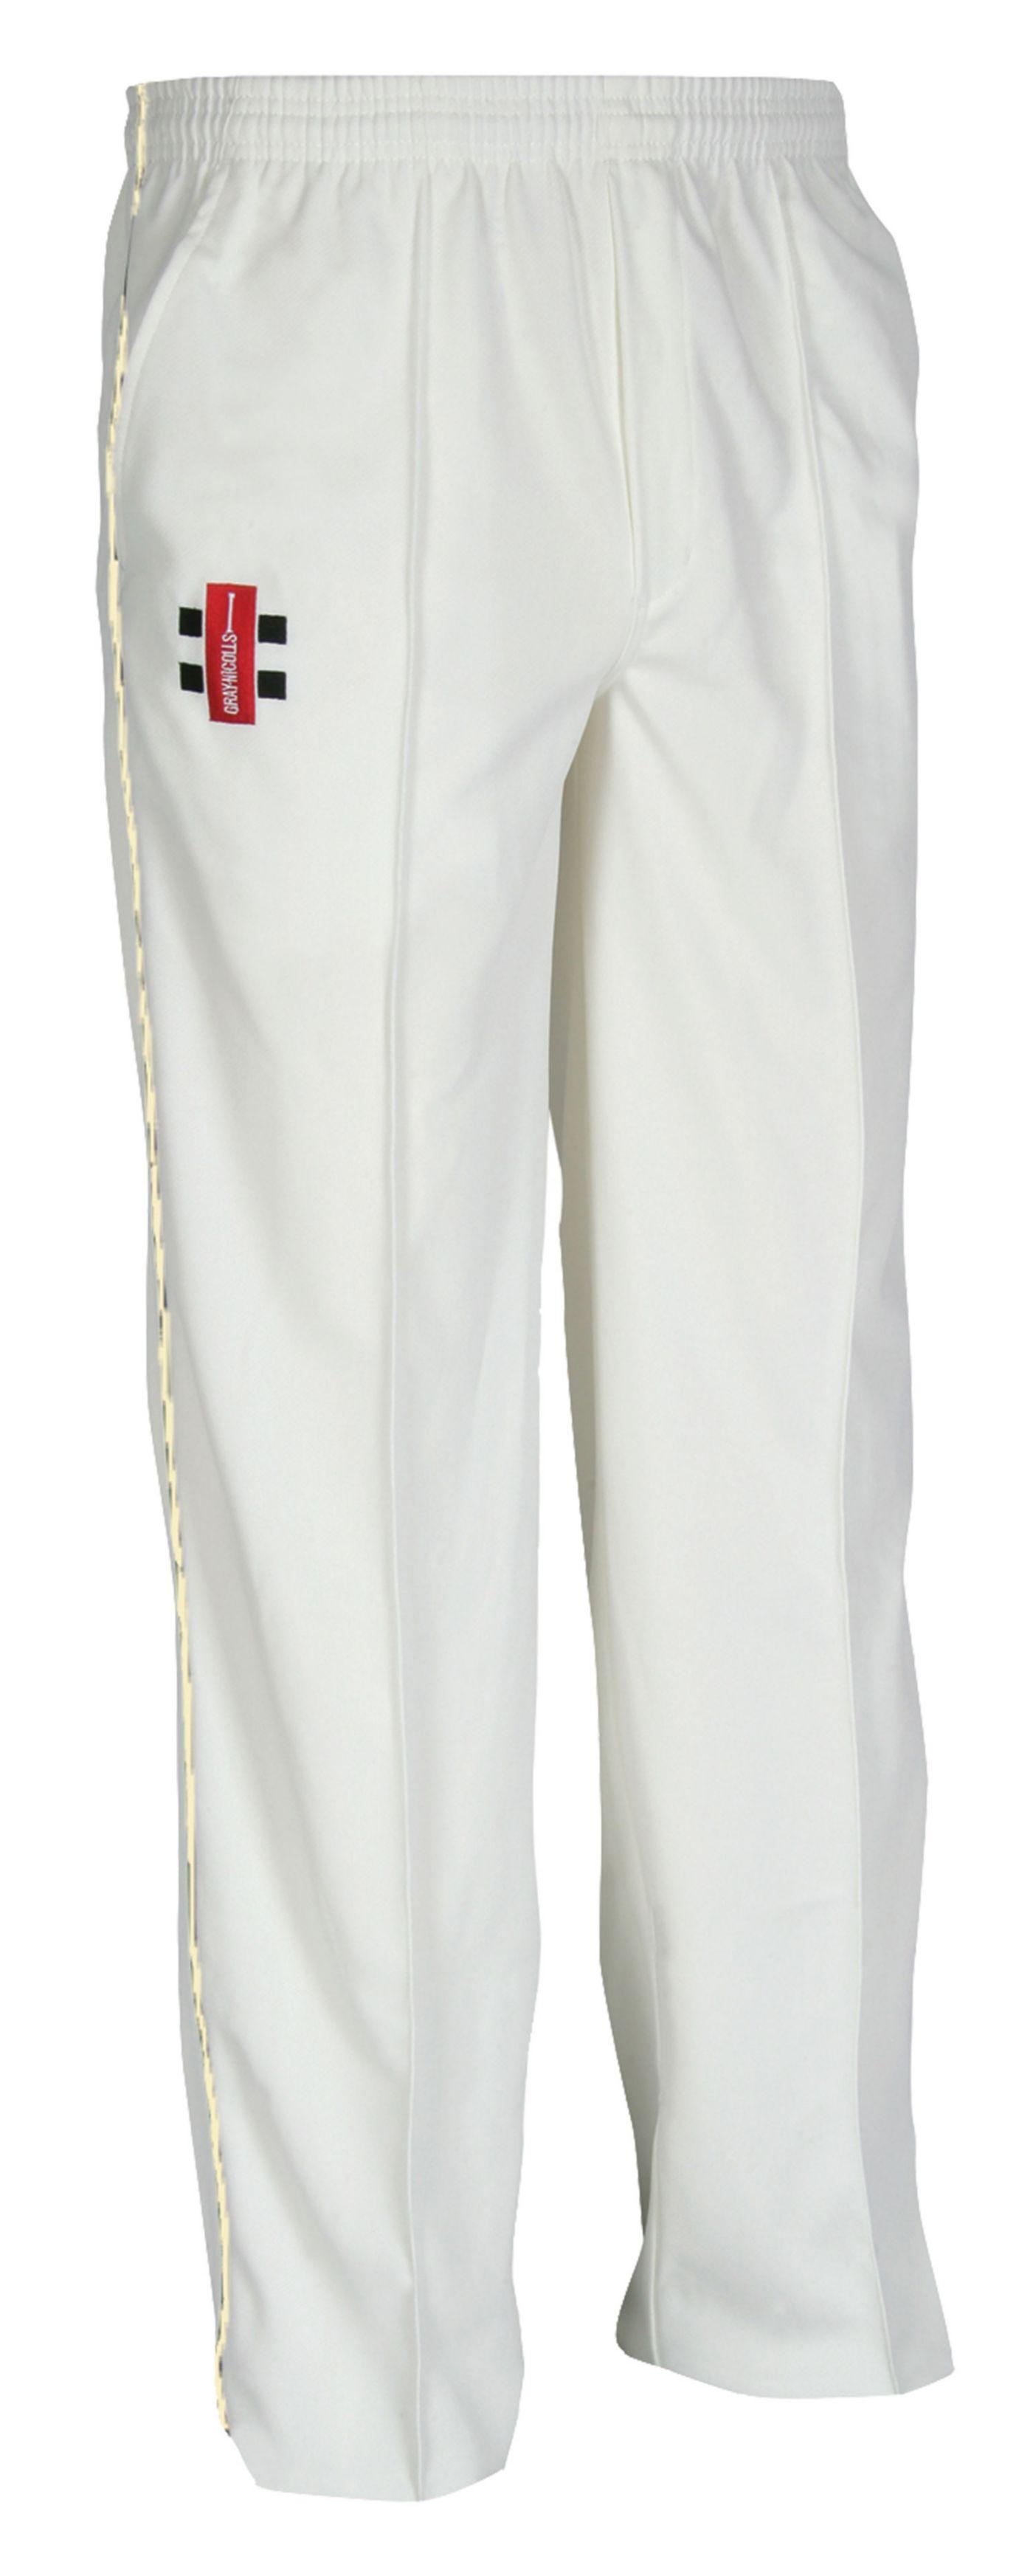 Gray Nicolls Adult Matrix Cricket Pants